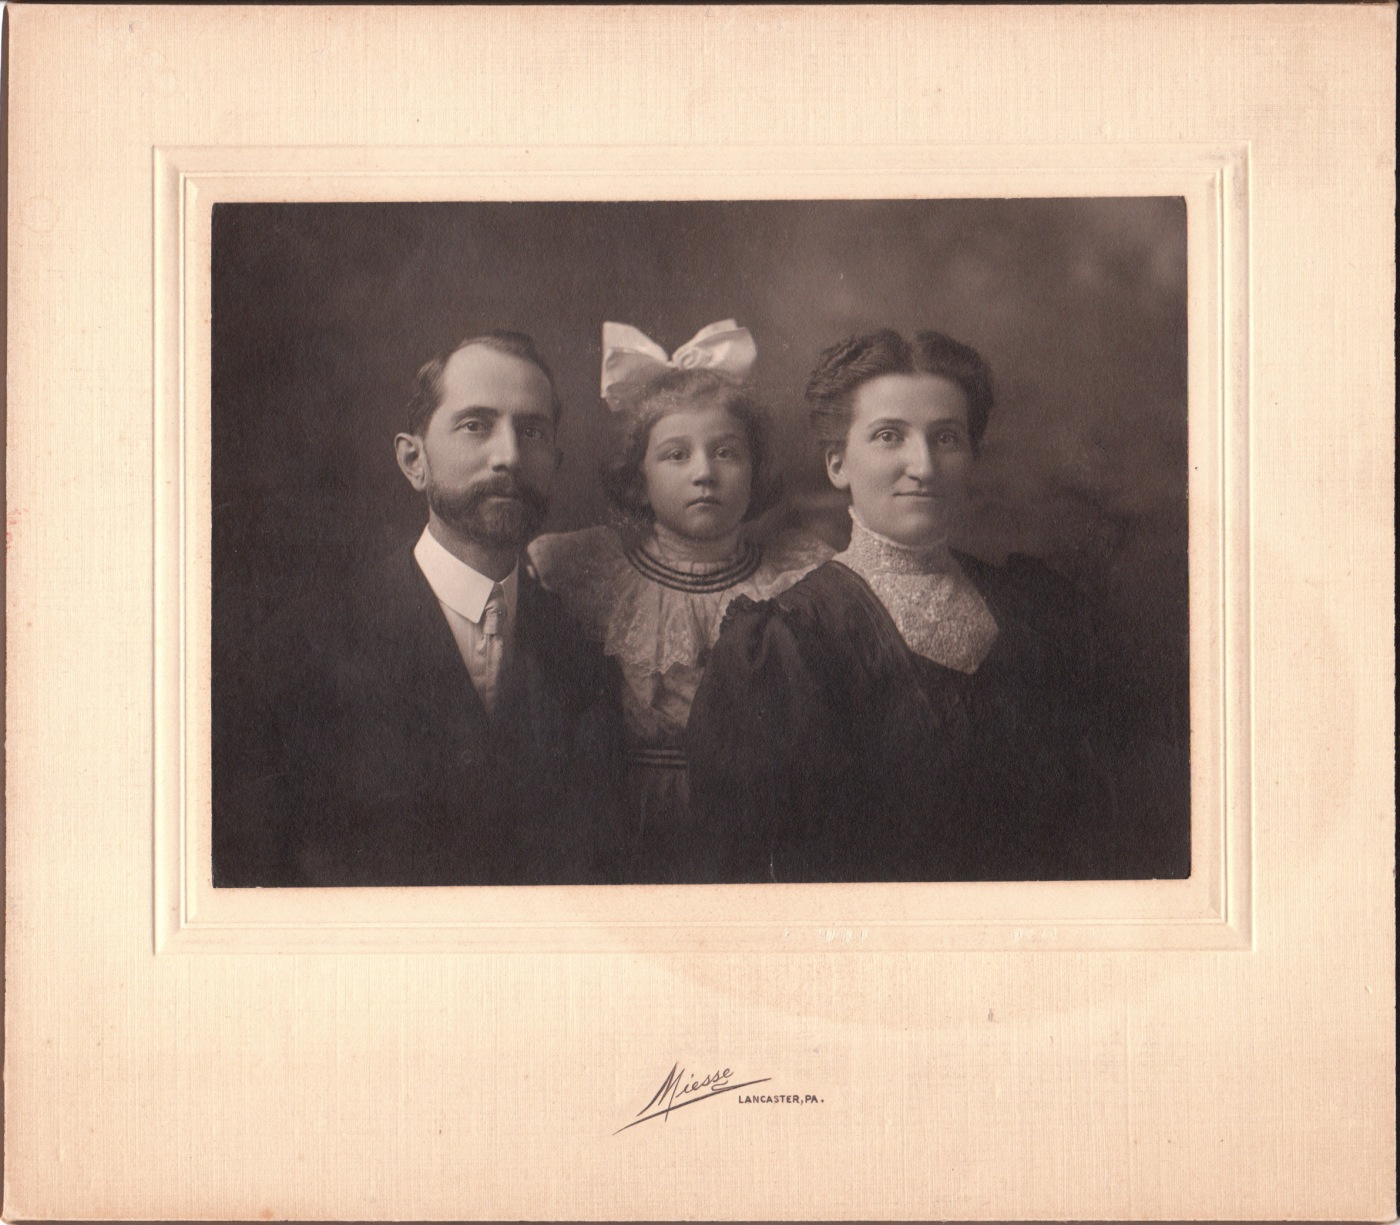 MEET THE HERSHEY FAMILY OF LANCASTER, PENNSYLVANIA | THE